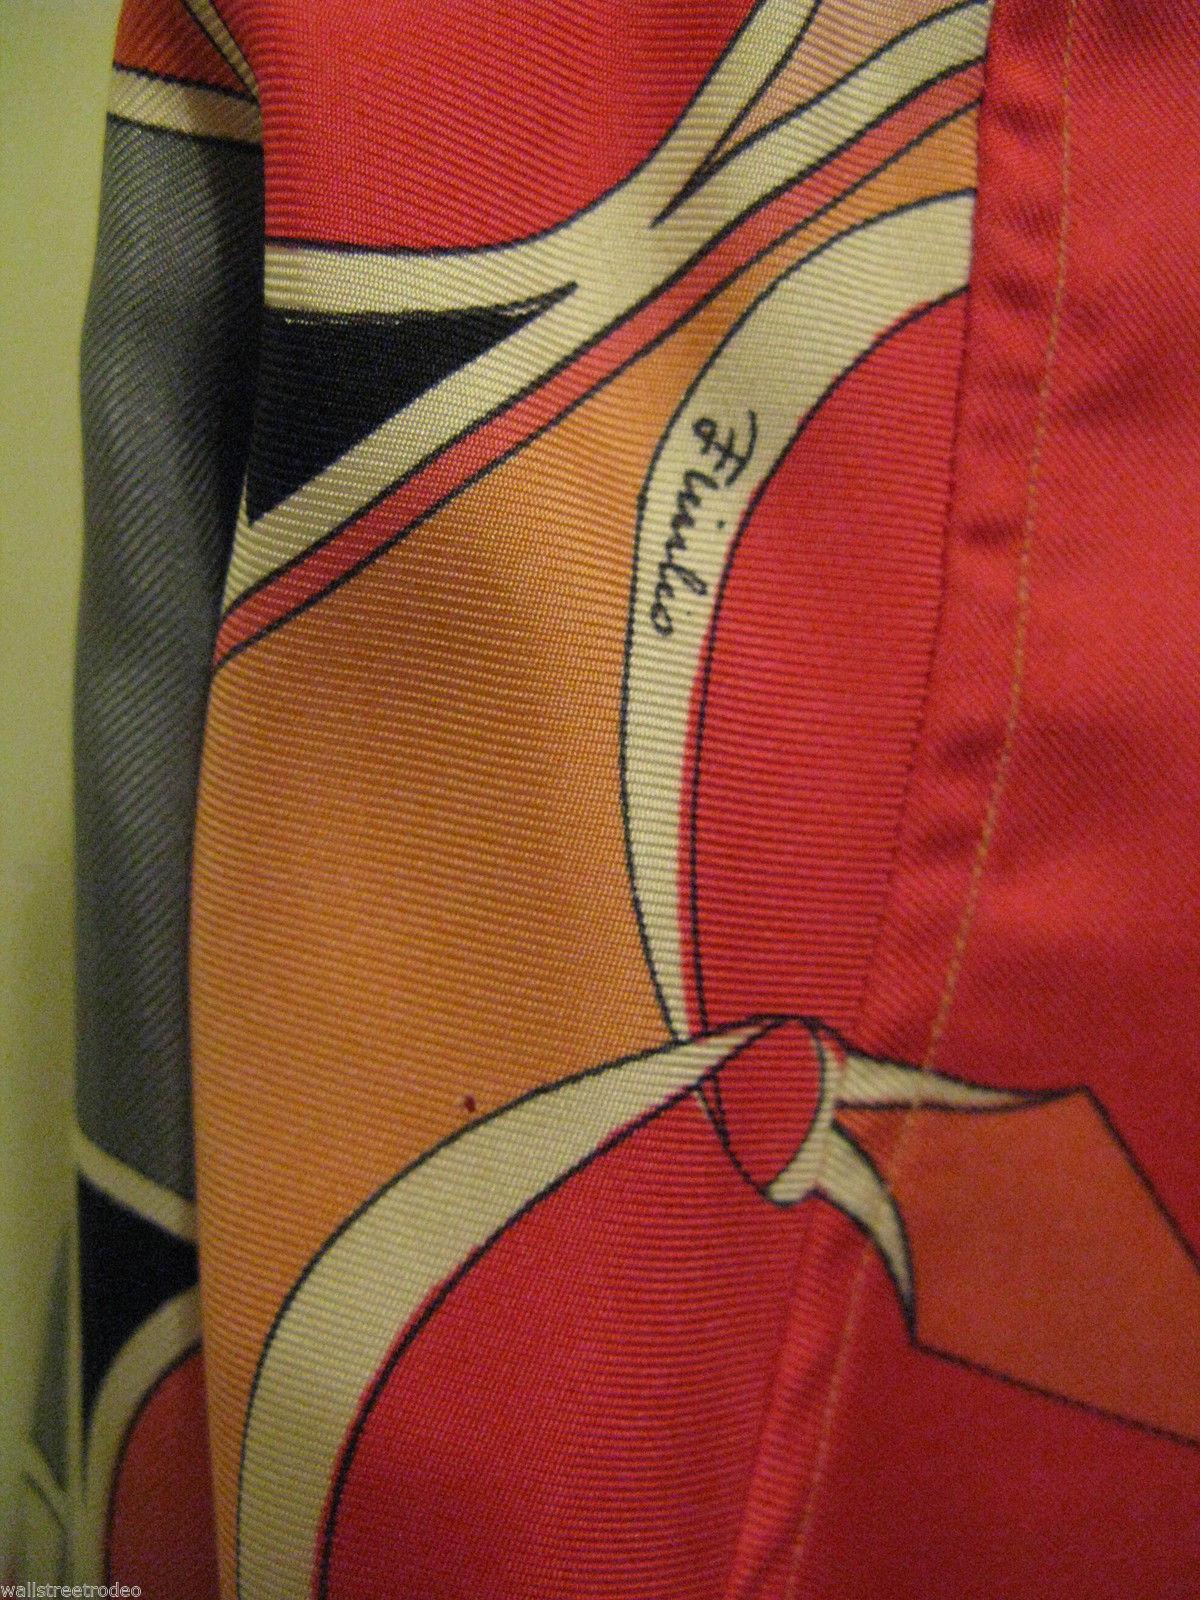 Vintage Emilio Pucci Saks fifth Avenue Iconic pop art silk 1960s Italy shirt 8 image 5